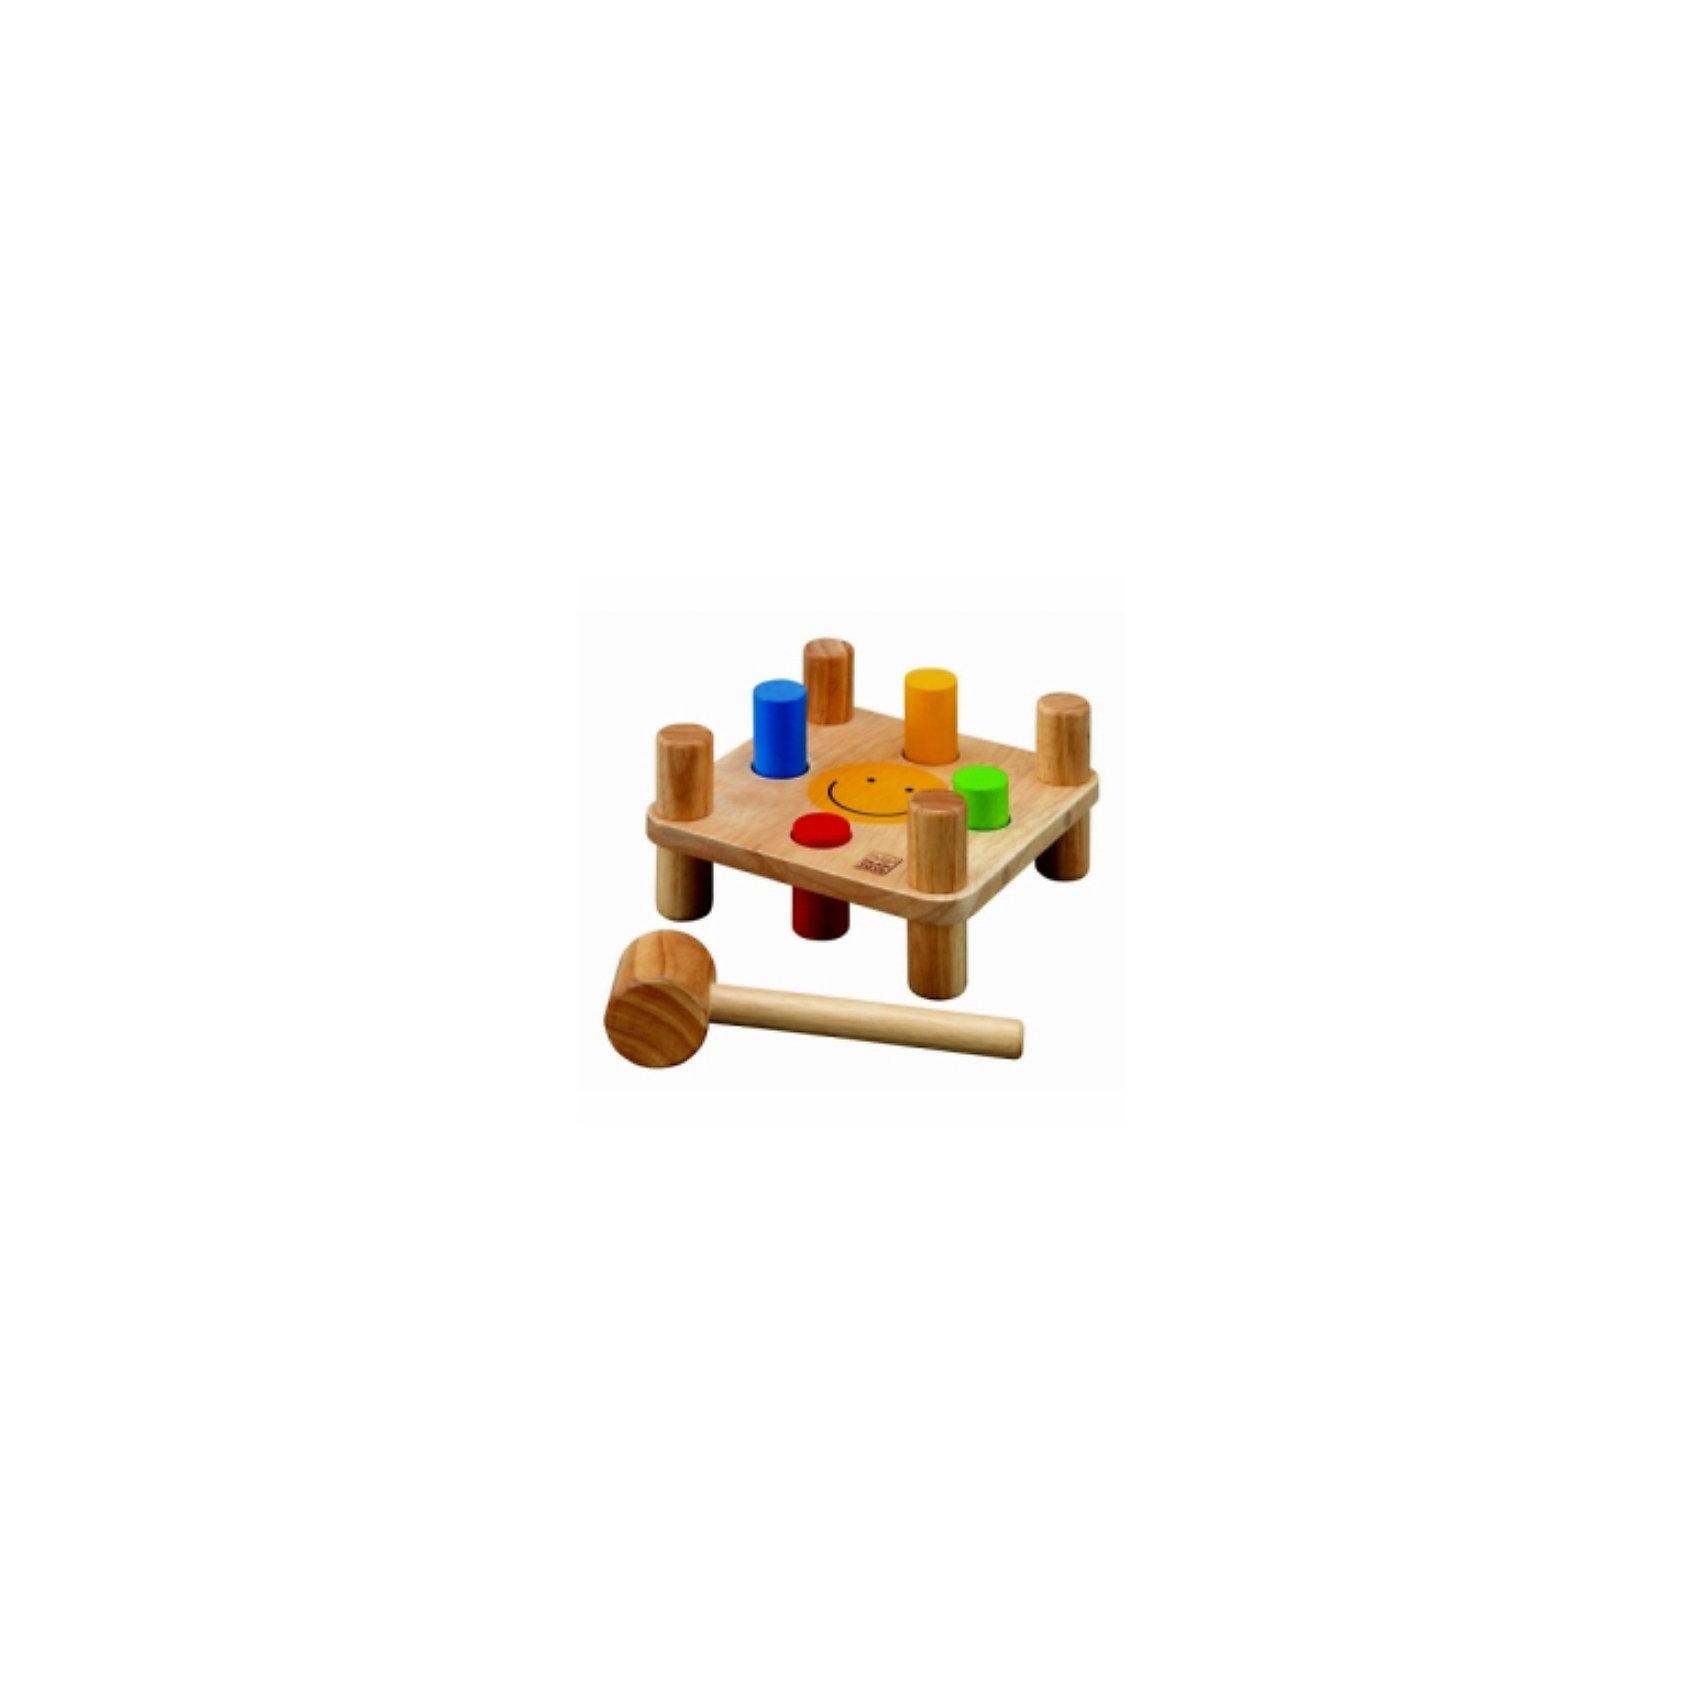 Plan Toys PLAN TOYS 5126 Забивалка игровые наборы plan toys дом